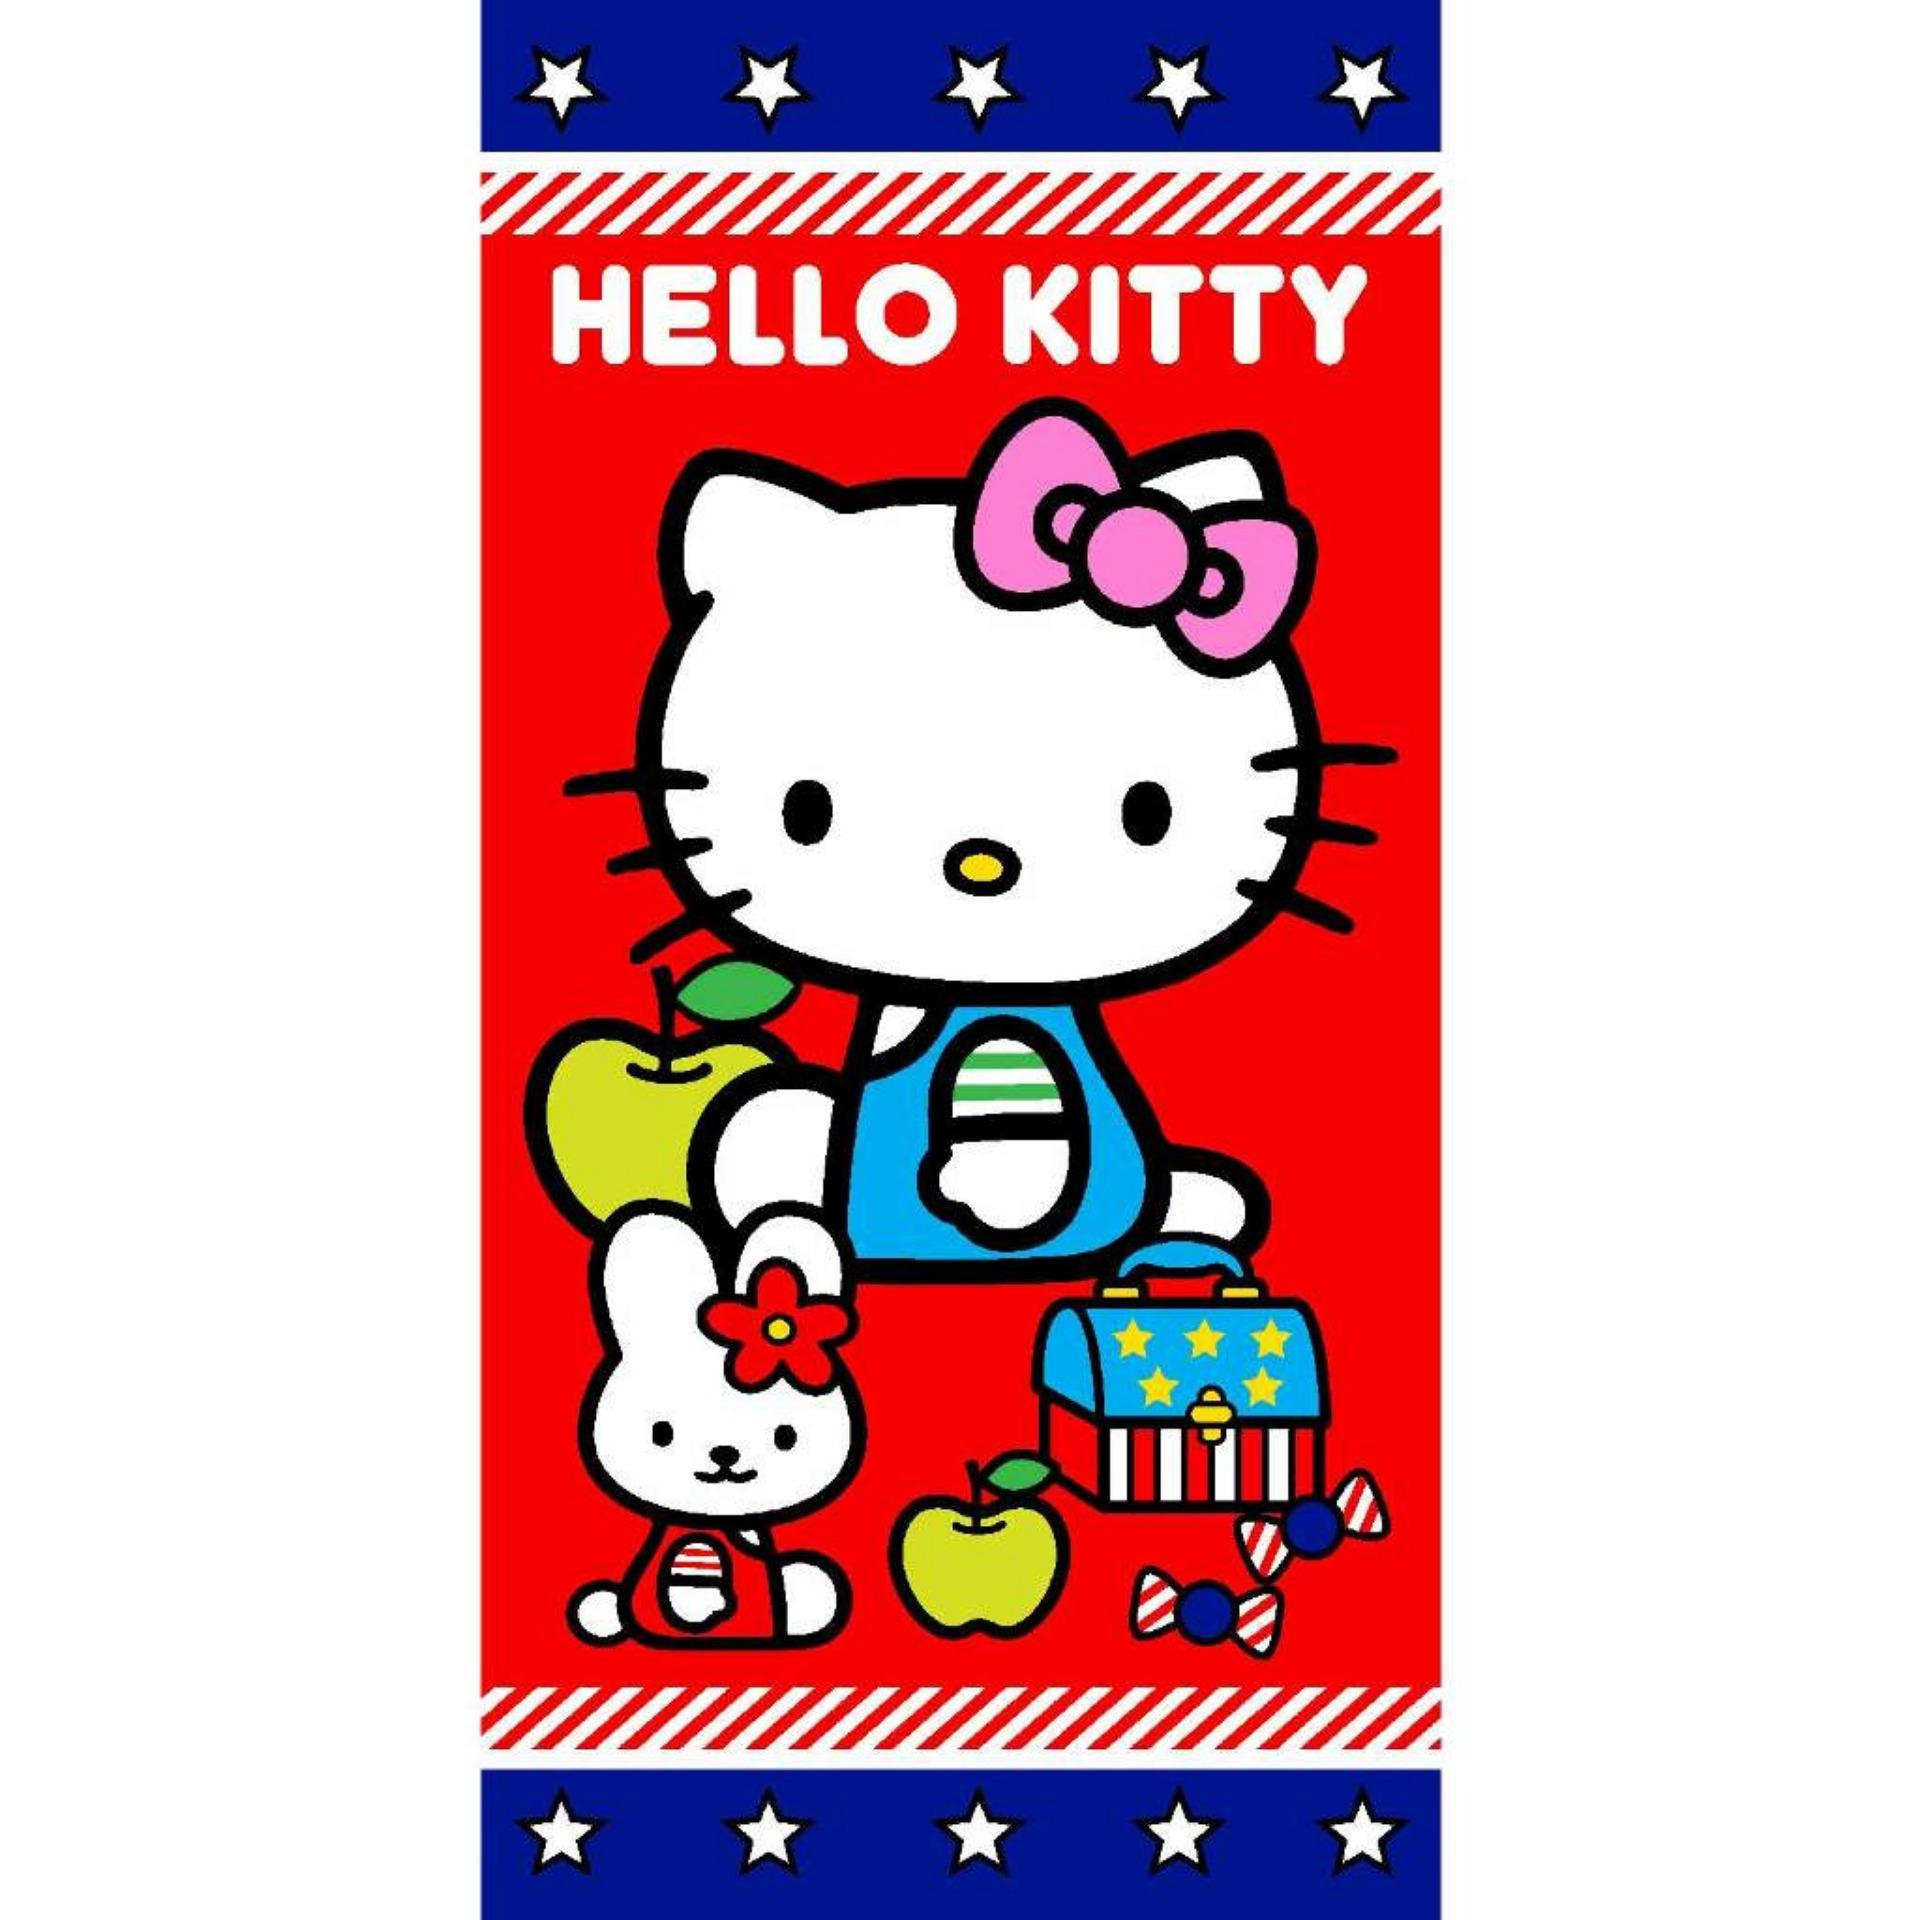 Rosanna Handuk Printing Panel 50x100cm - Hello Kitty Apple